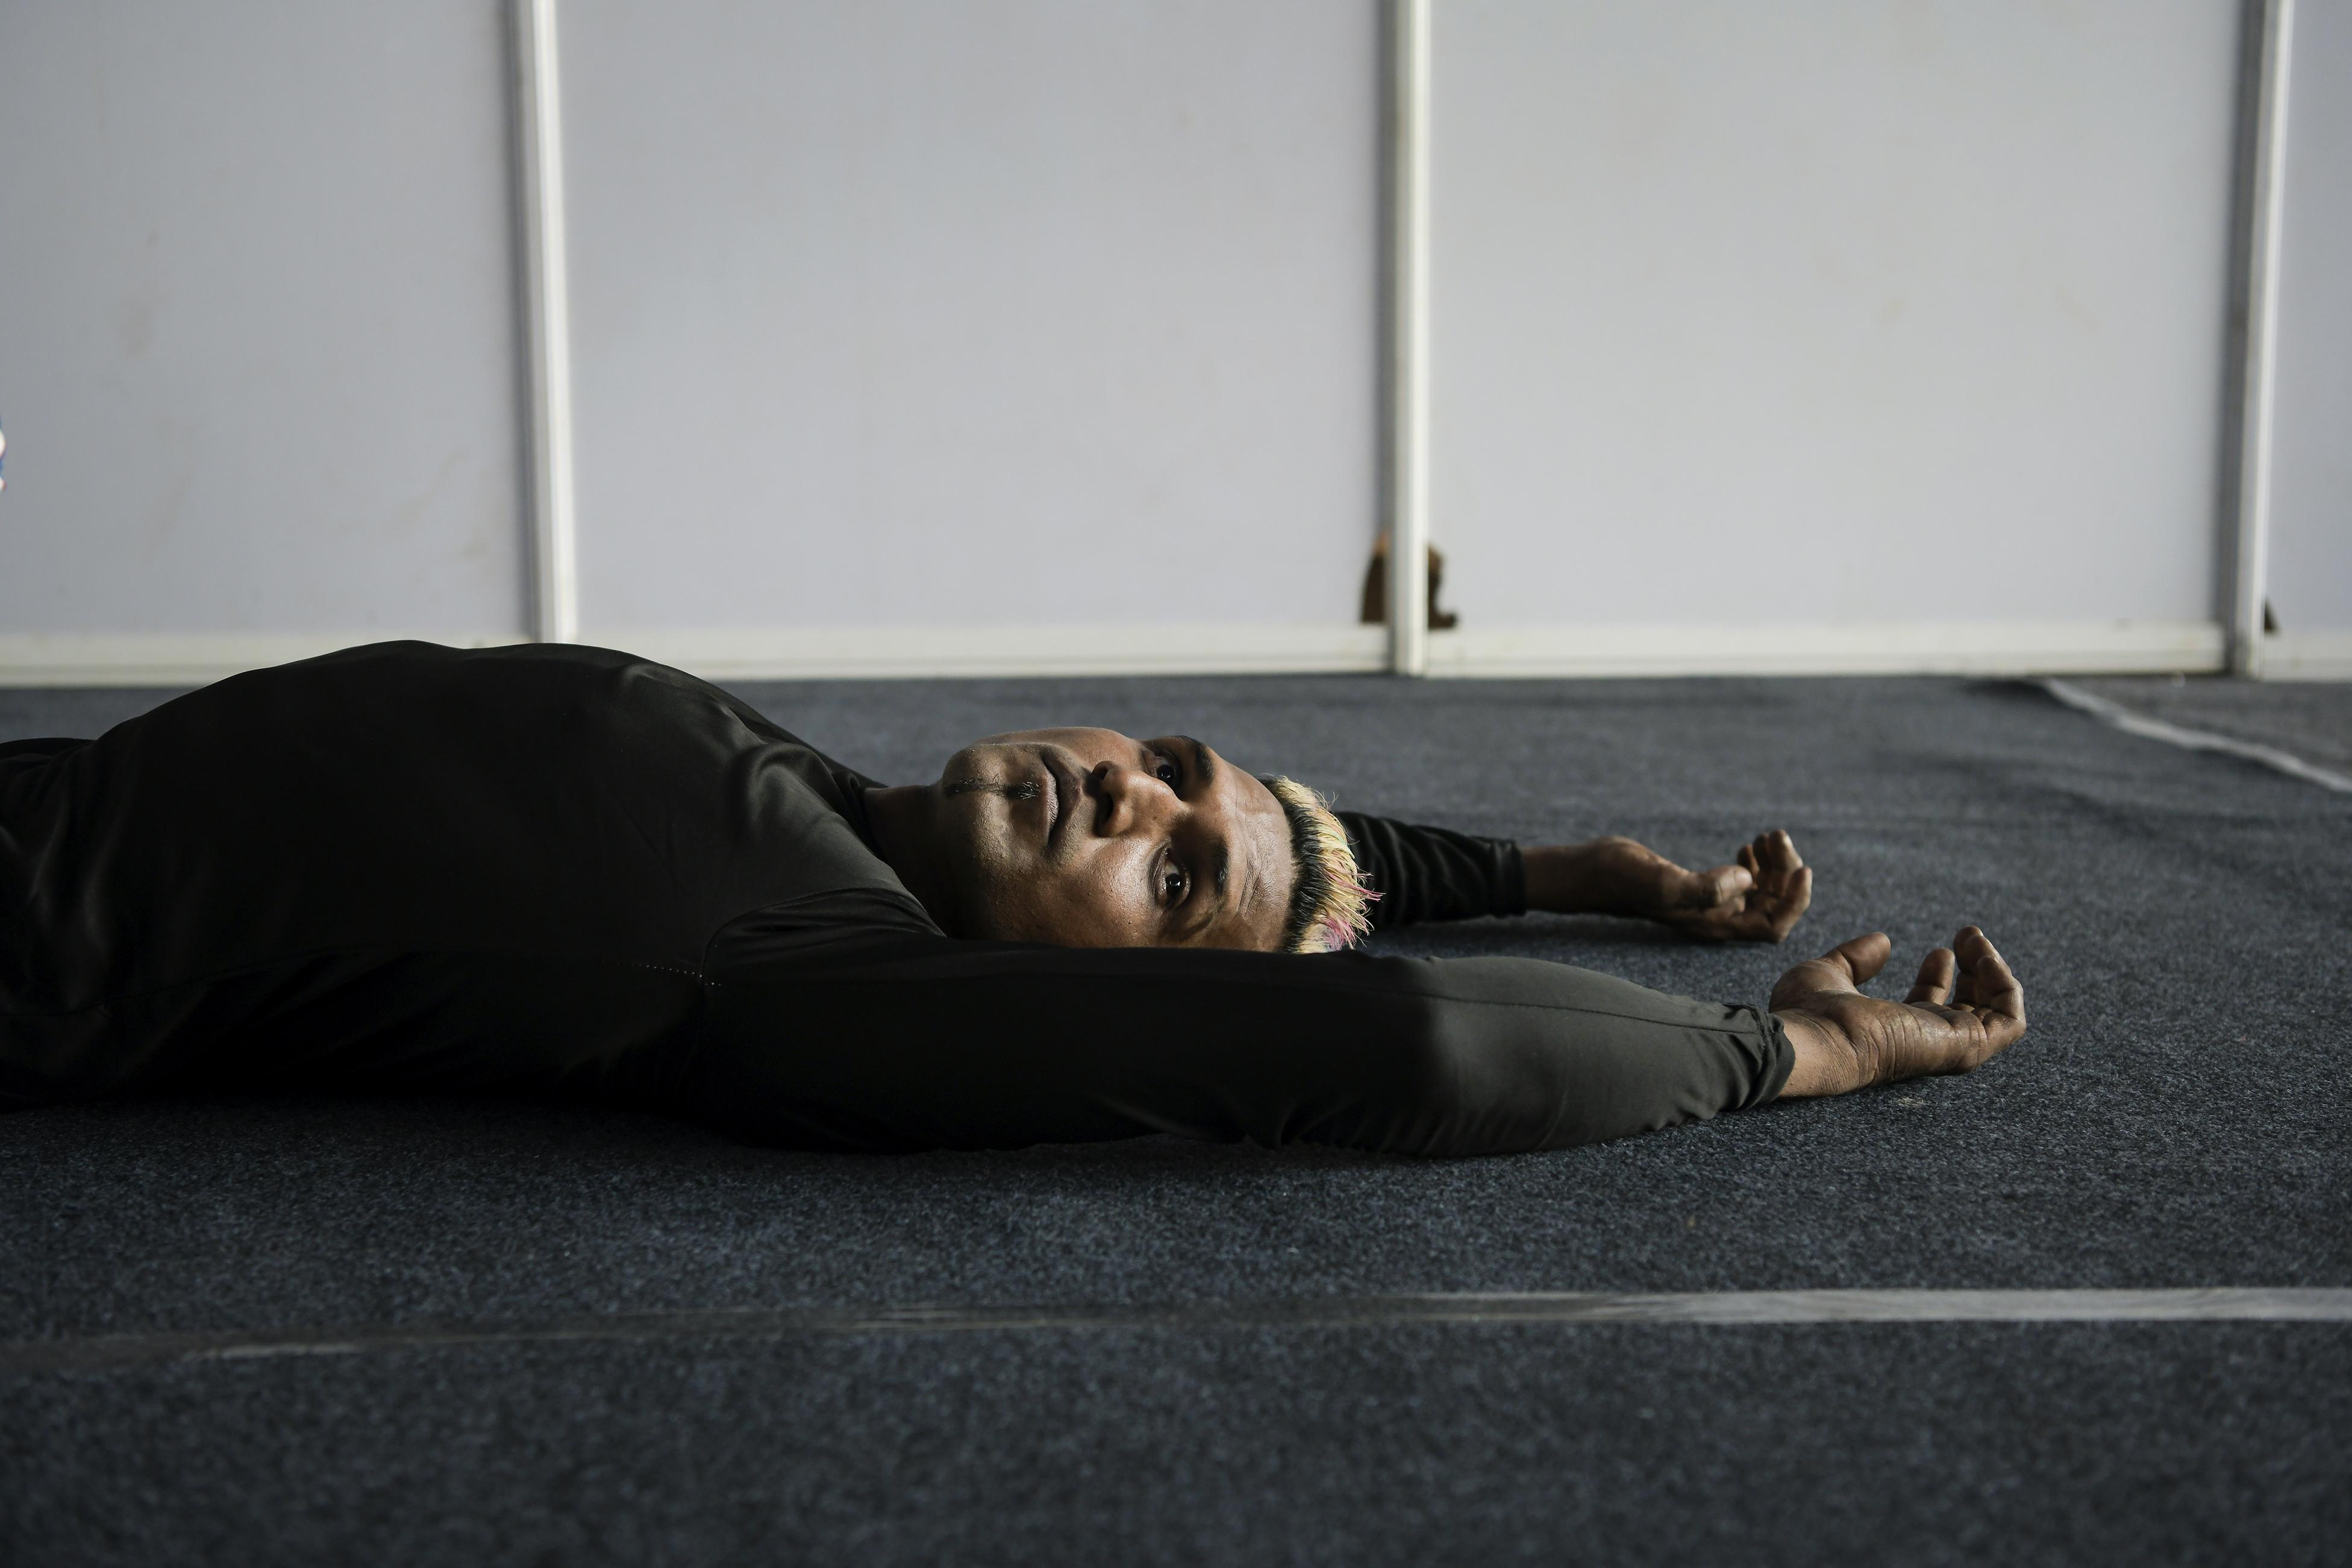 Soumen berbaring setelah latihan